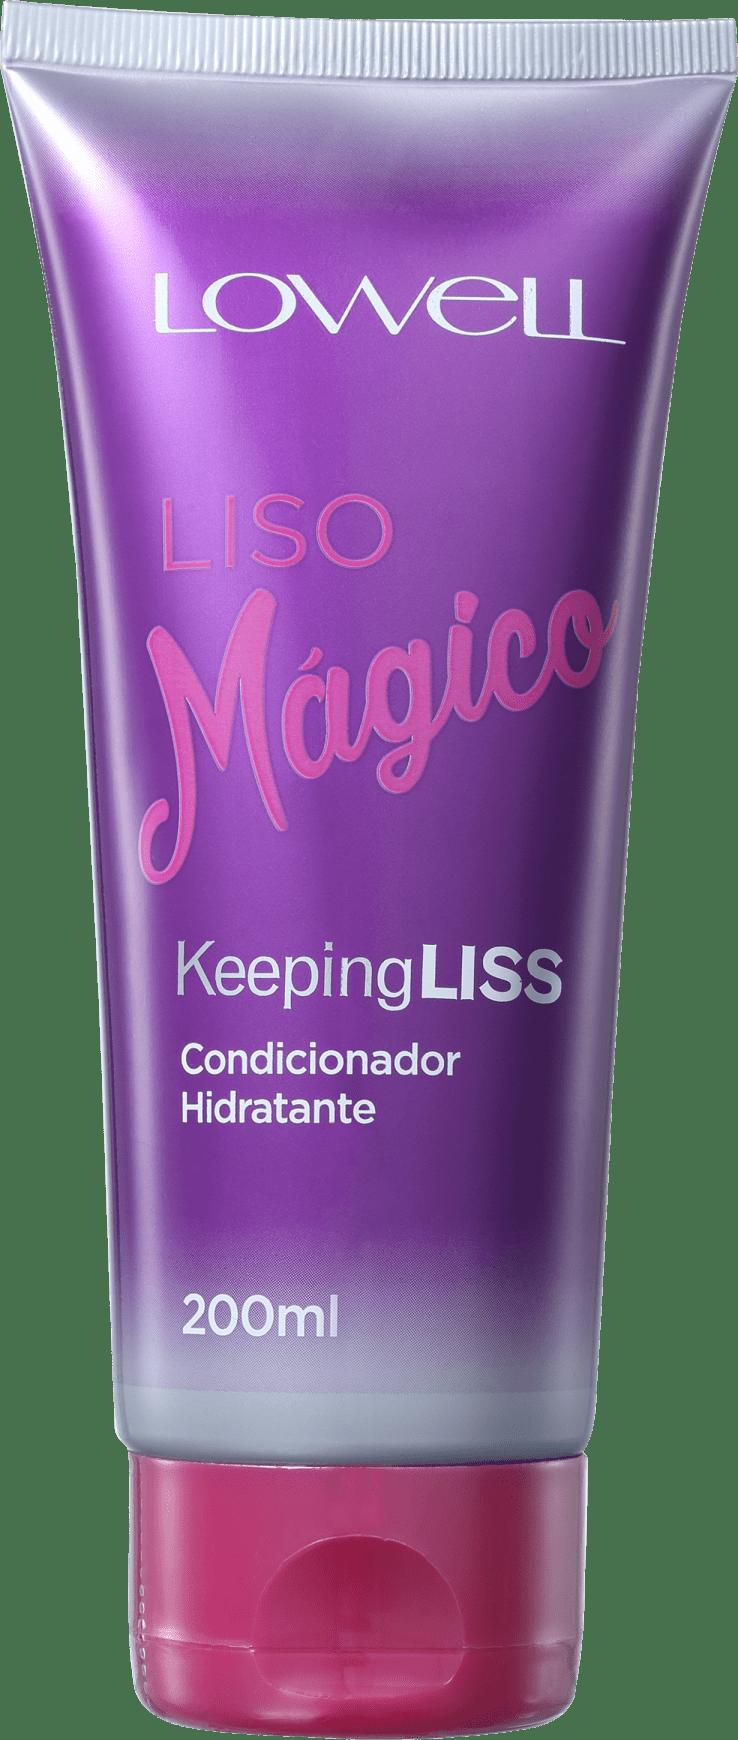 Liso Mágico Keeping Liss Condicionador 200ml - Lowell